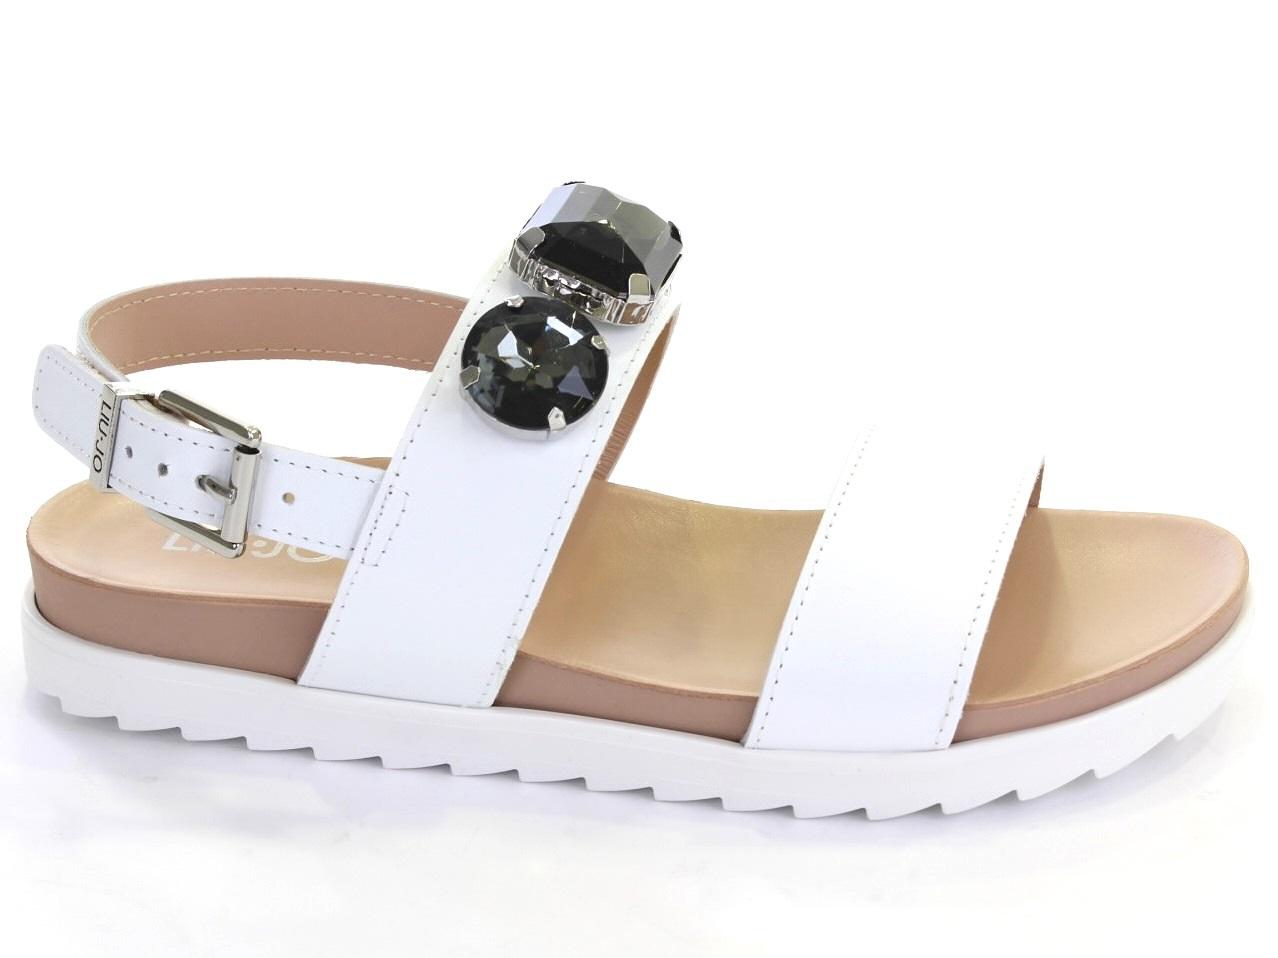 Sandales Plates Liu Jo - 672 S18163 P0168